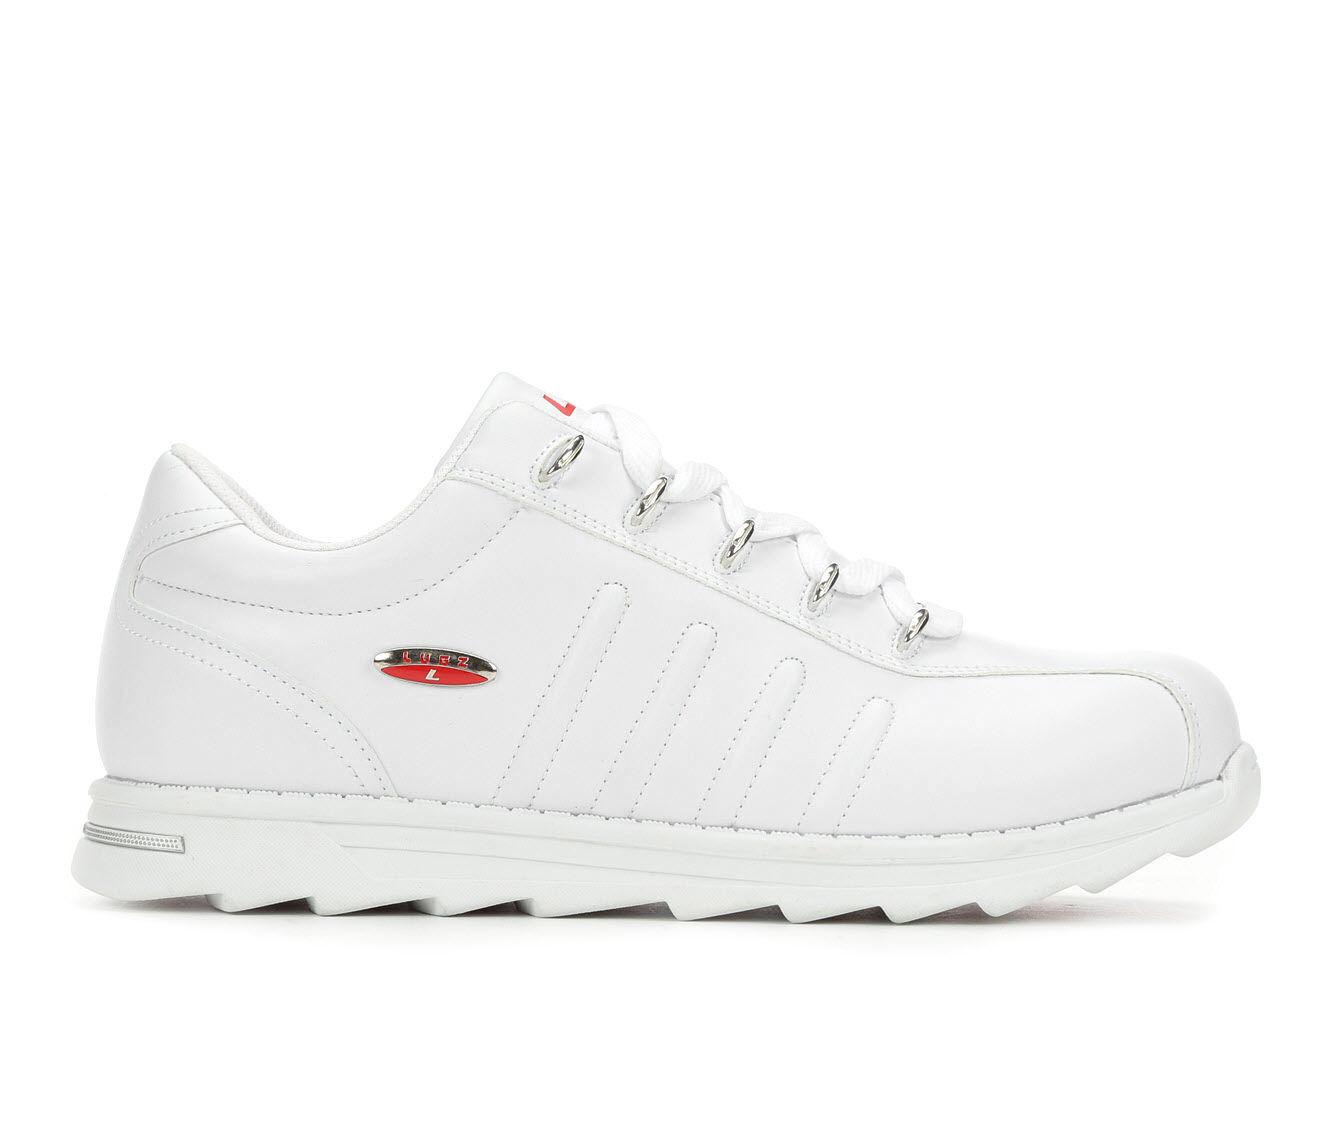 uk shoes_kd2033